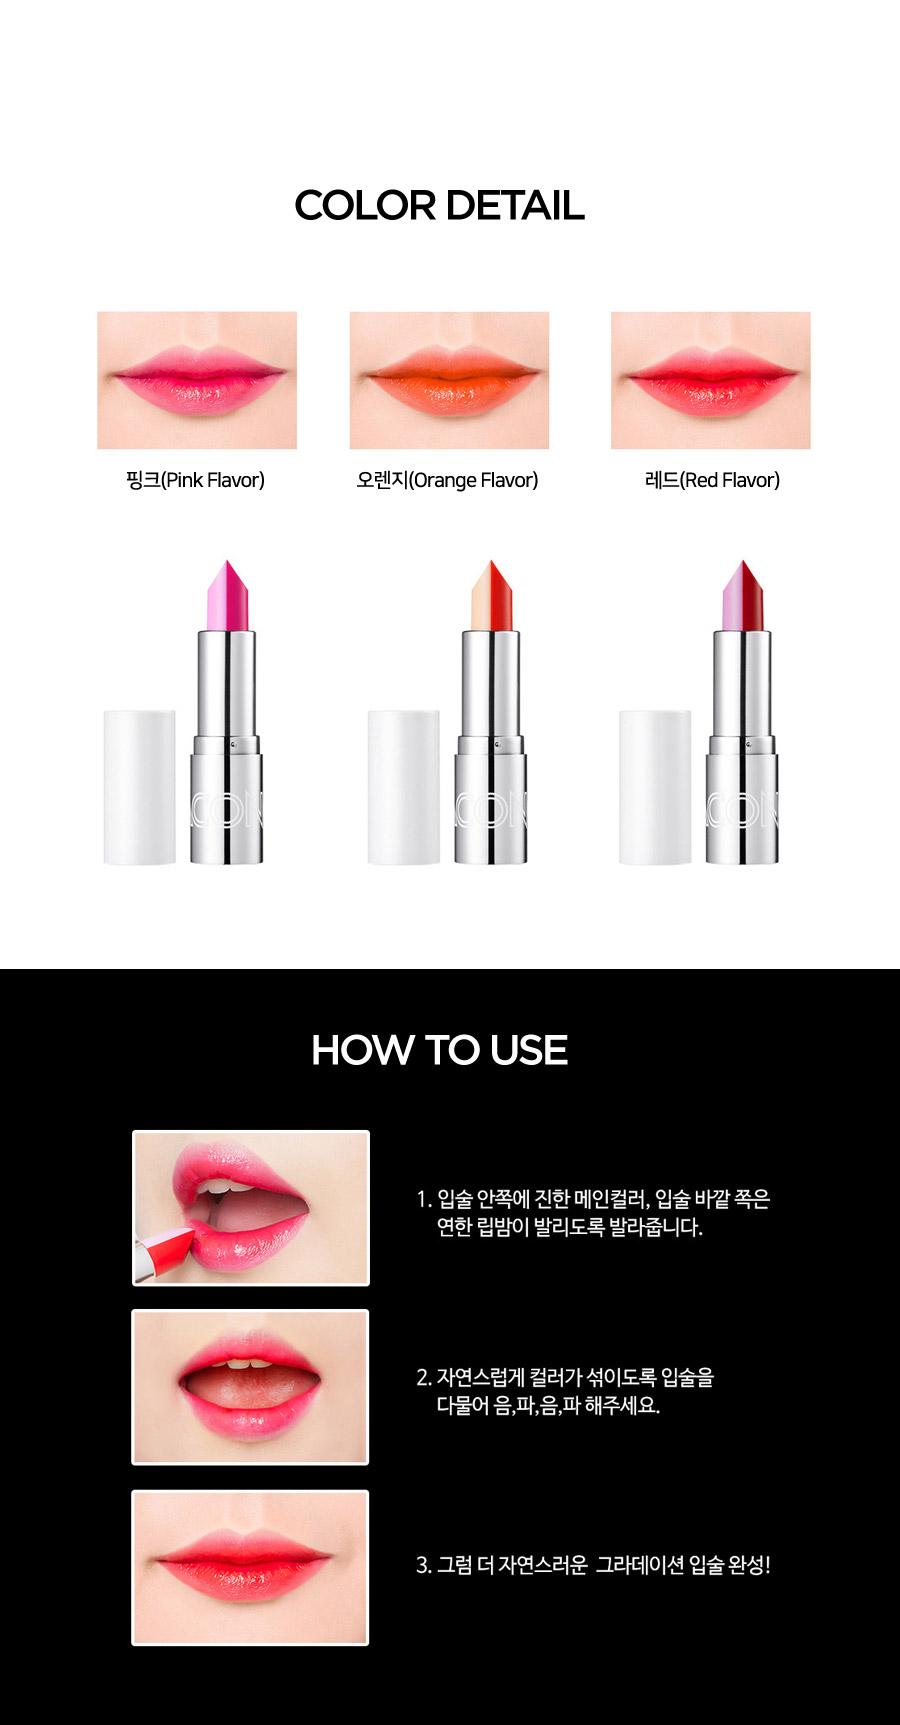 Chewing two-tone tint lip balm